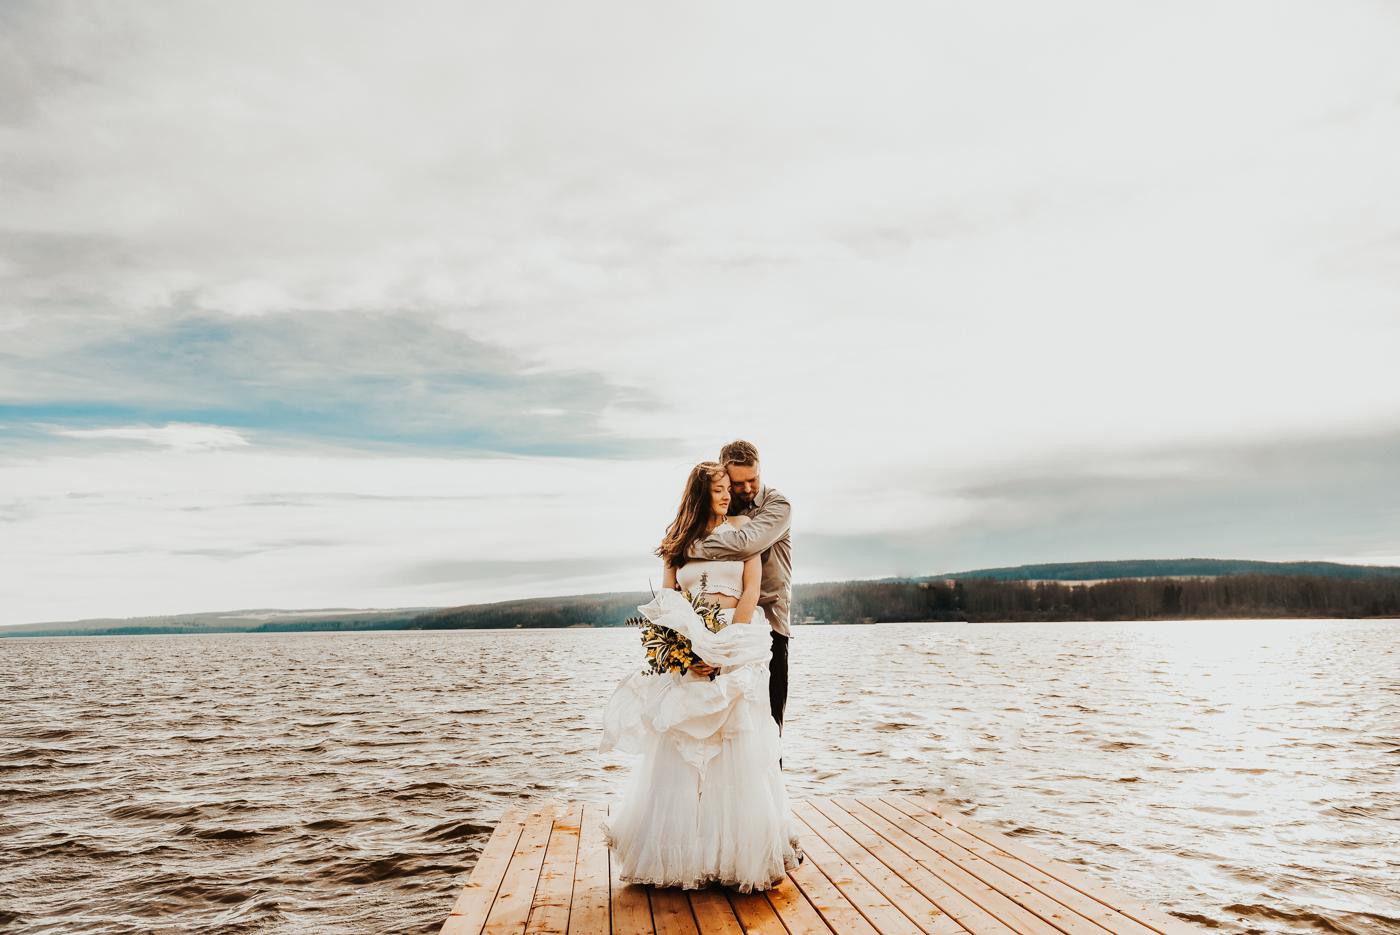 FortSt.John_photographer_TyraEPhotography_Wedding_Couple_Family_Photograhy_DawsonCreek_Elopement_Bride_Boduoir_Portraits-12.jpg